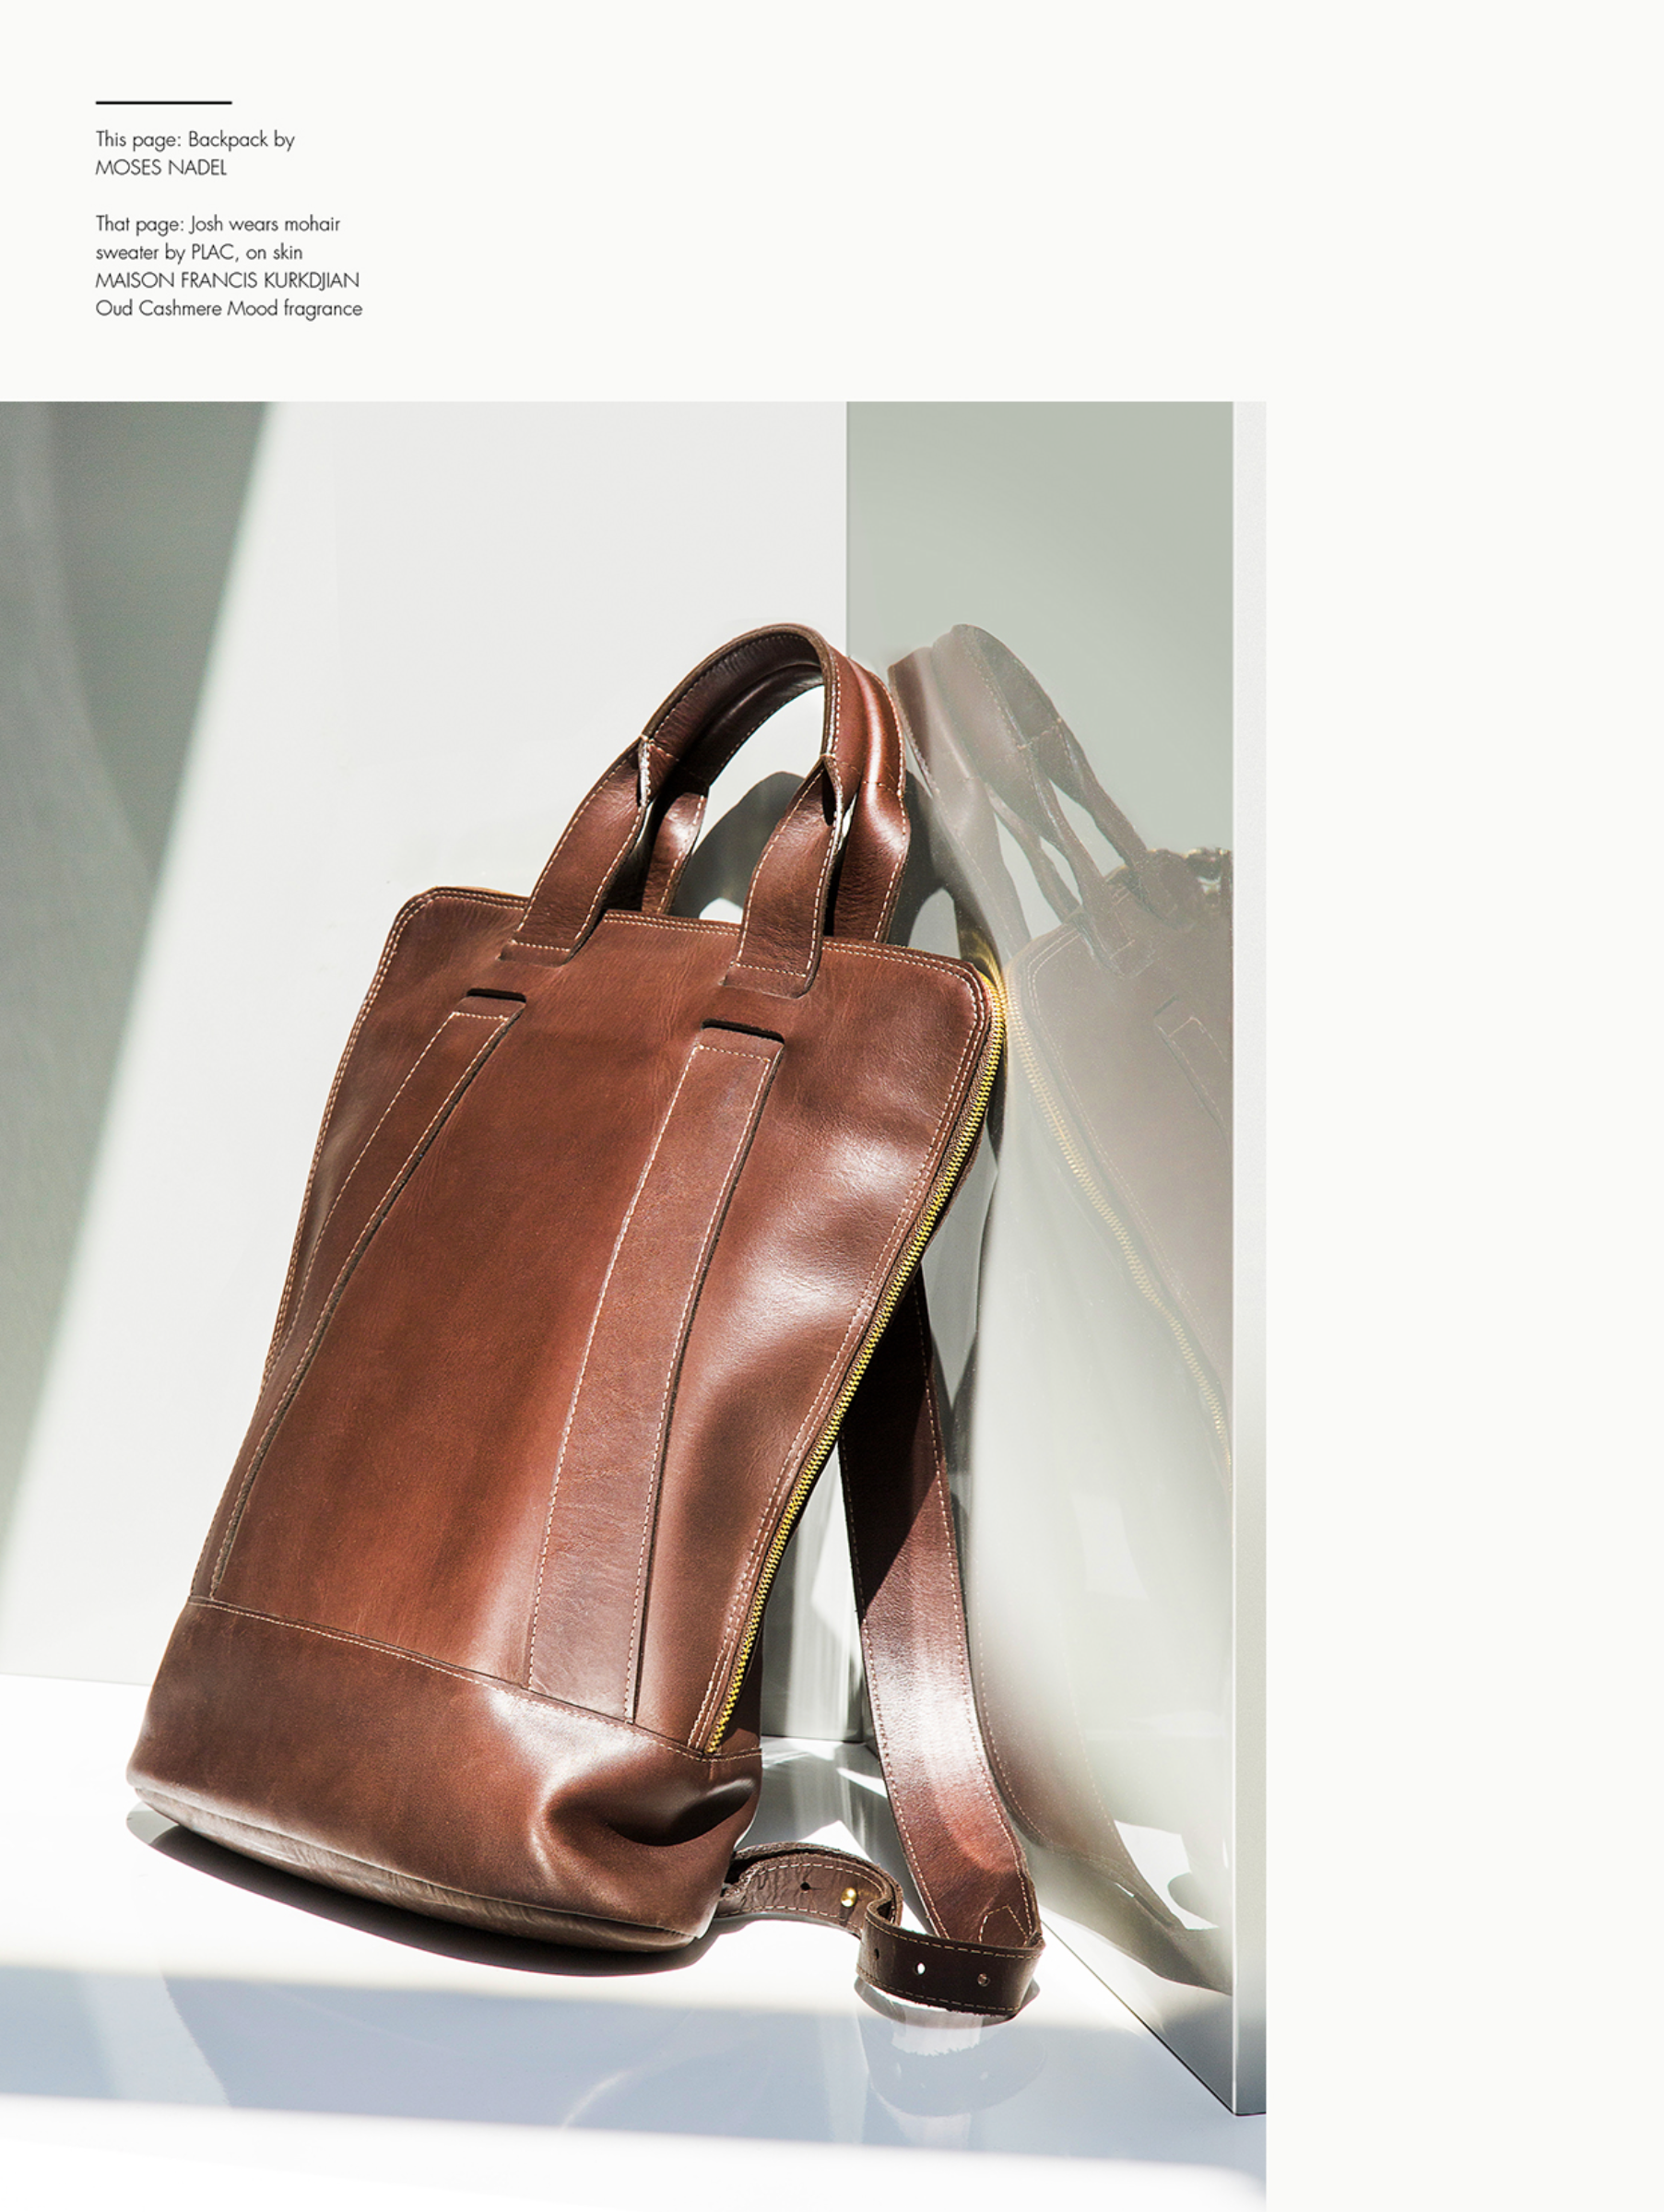 Backpack Brief  in Brown Explorer - The Perfect Man Magazine | Photo: Jenia Filatova